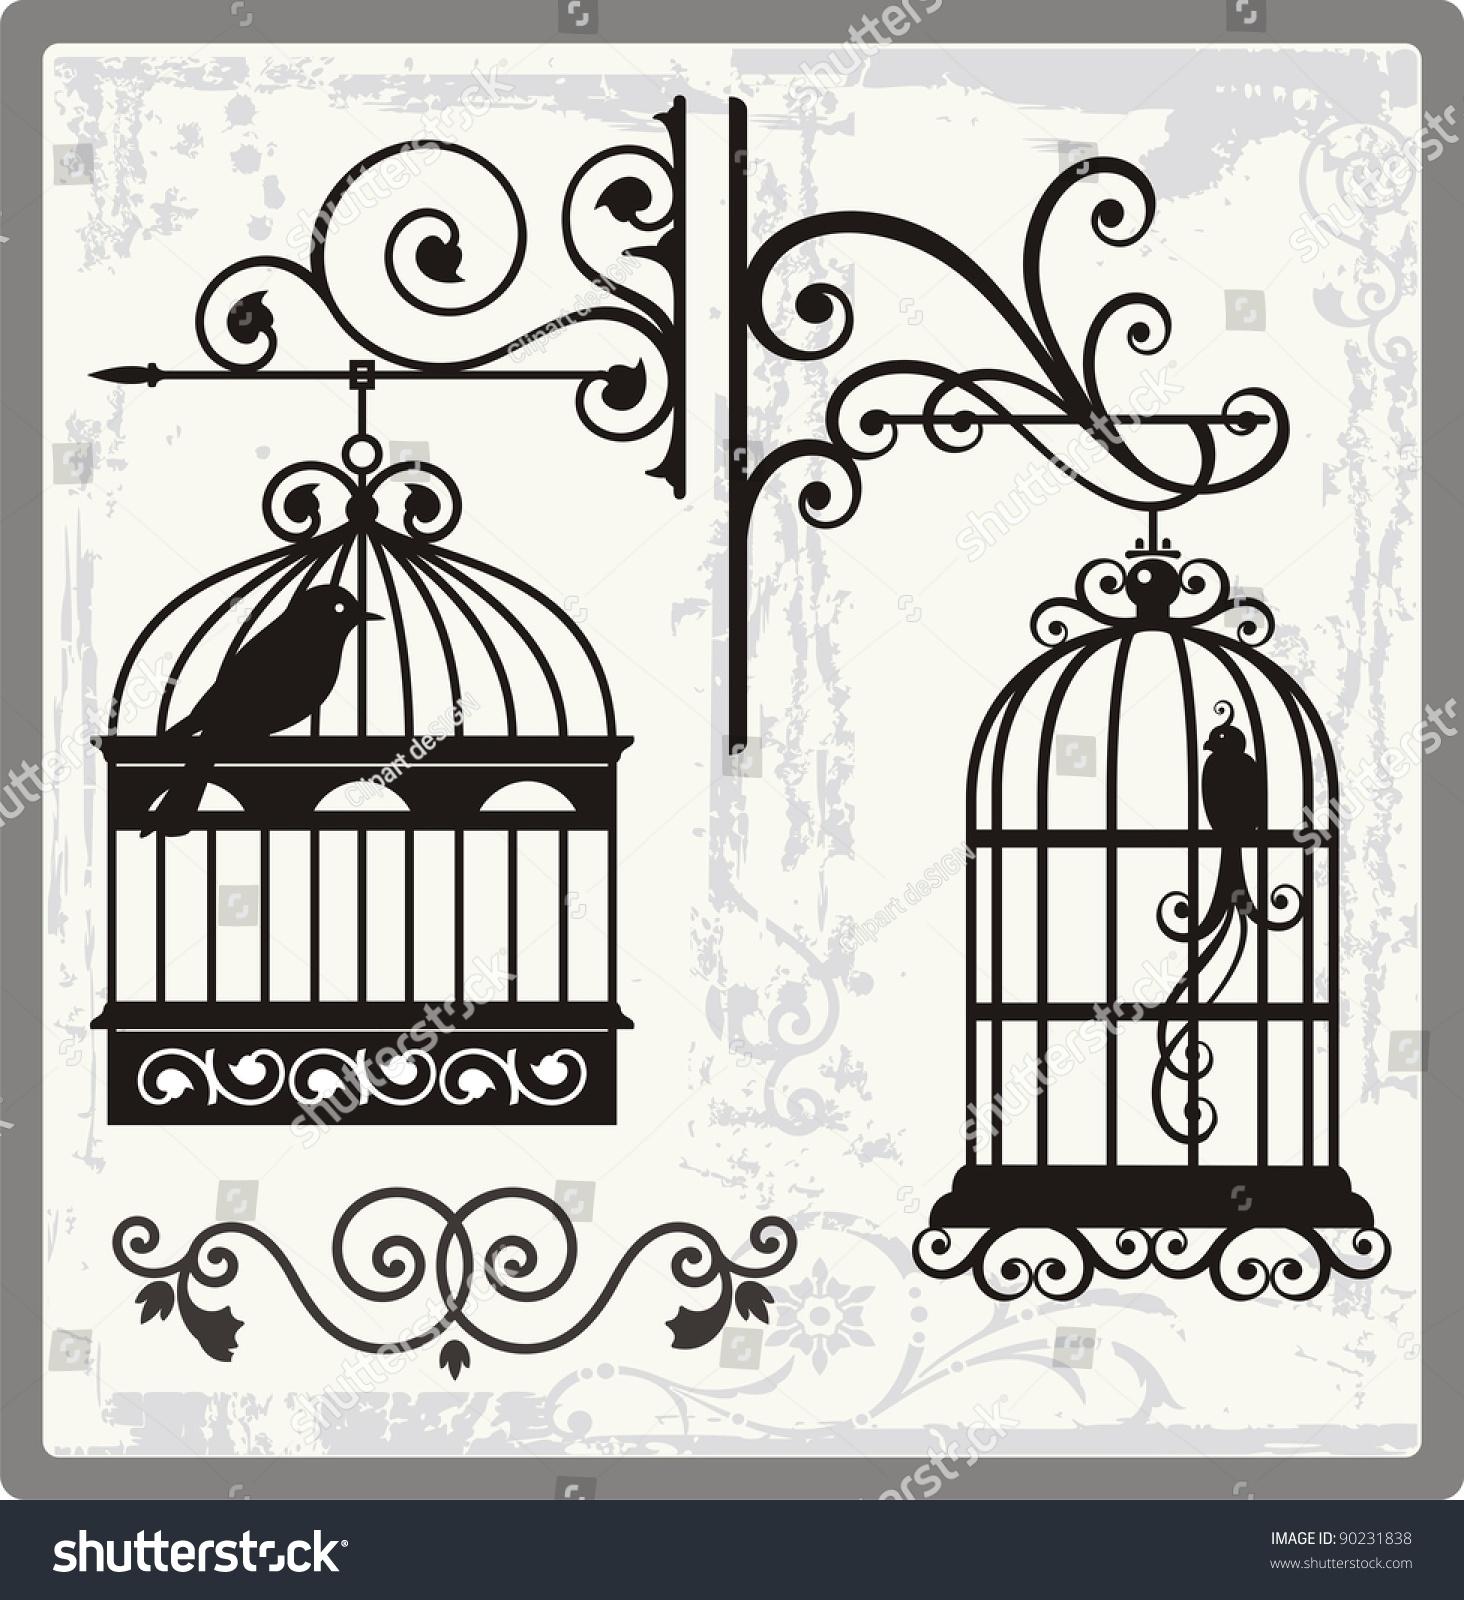 vintage bird cages ornamental decorations stock vector royalty free Diamond Dove Cage vintage bird cages with ornamental decorations